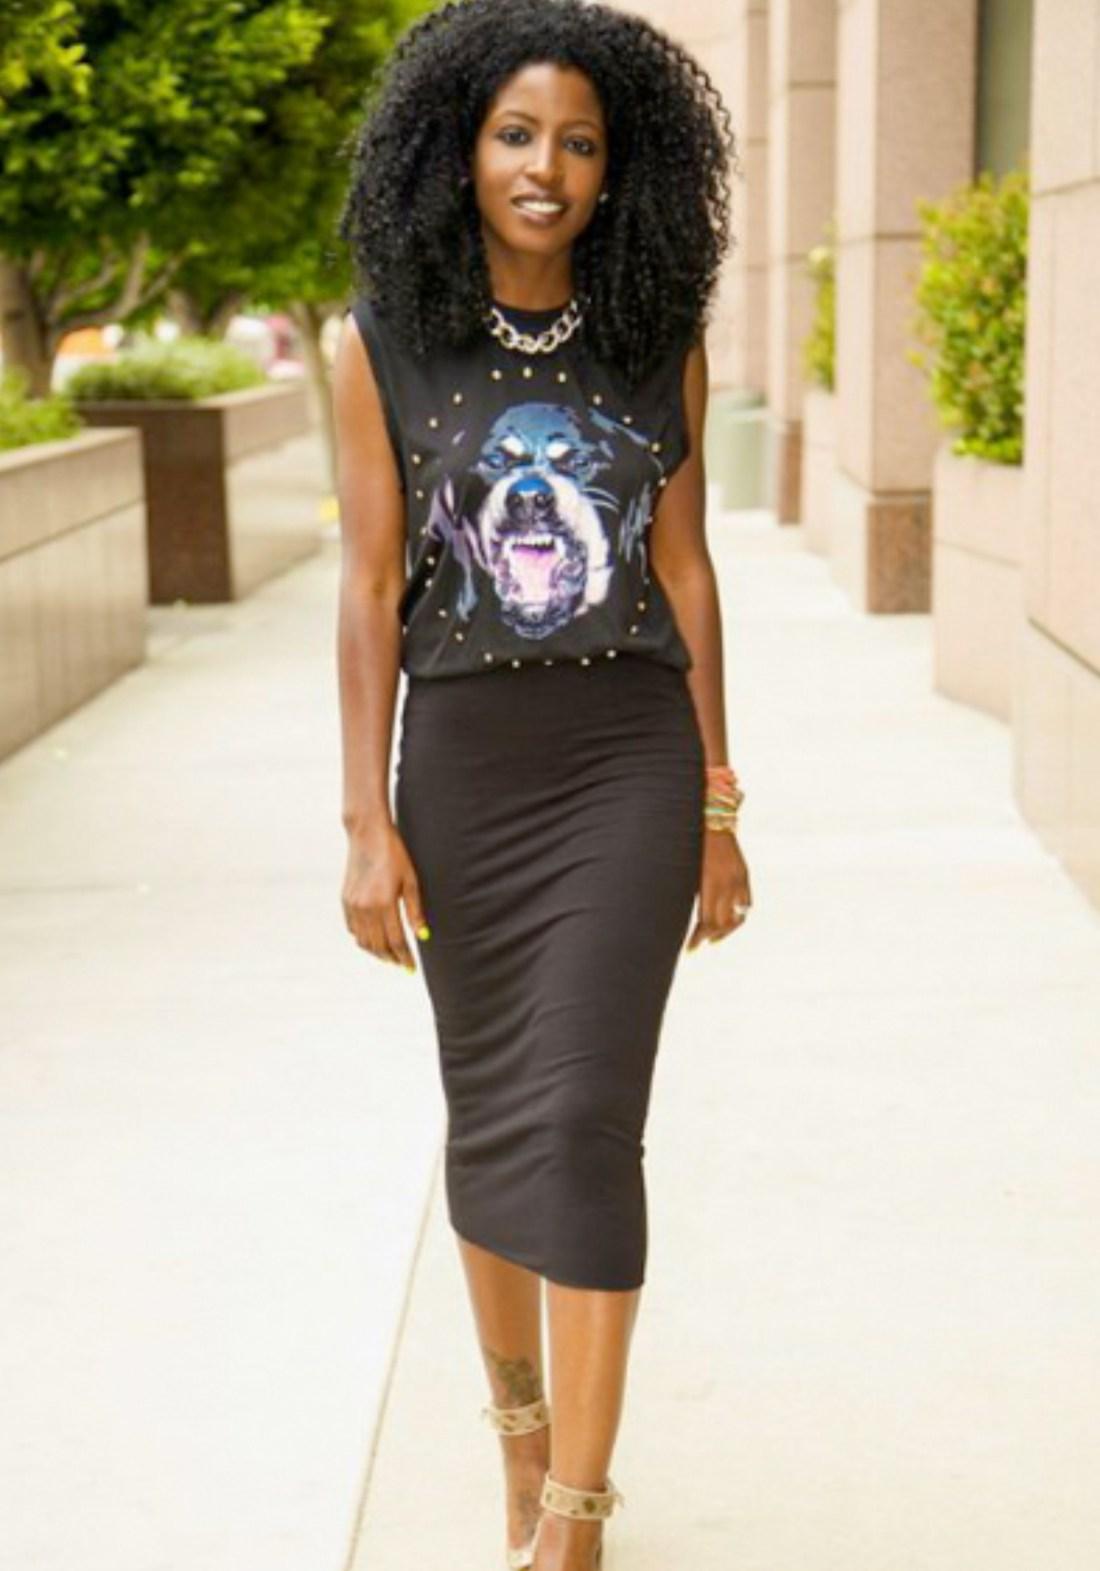 Black Midi Skirt + Givenchy Rottweiler Muscle Tee | https://thehautemommie.com/haute-style-midi-skirts-tee-shirts/